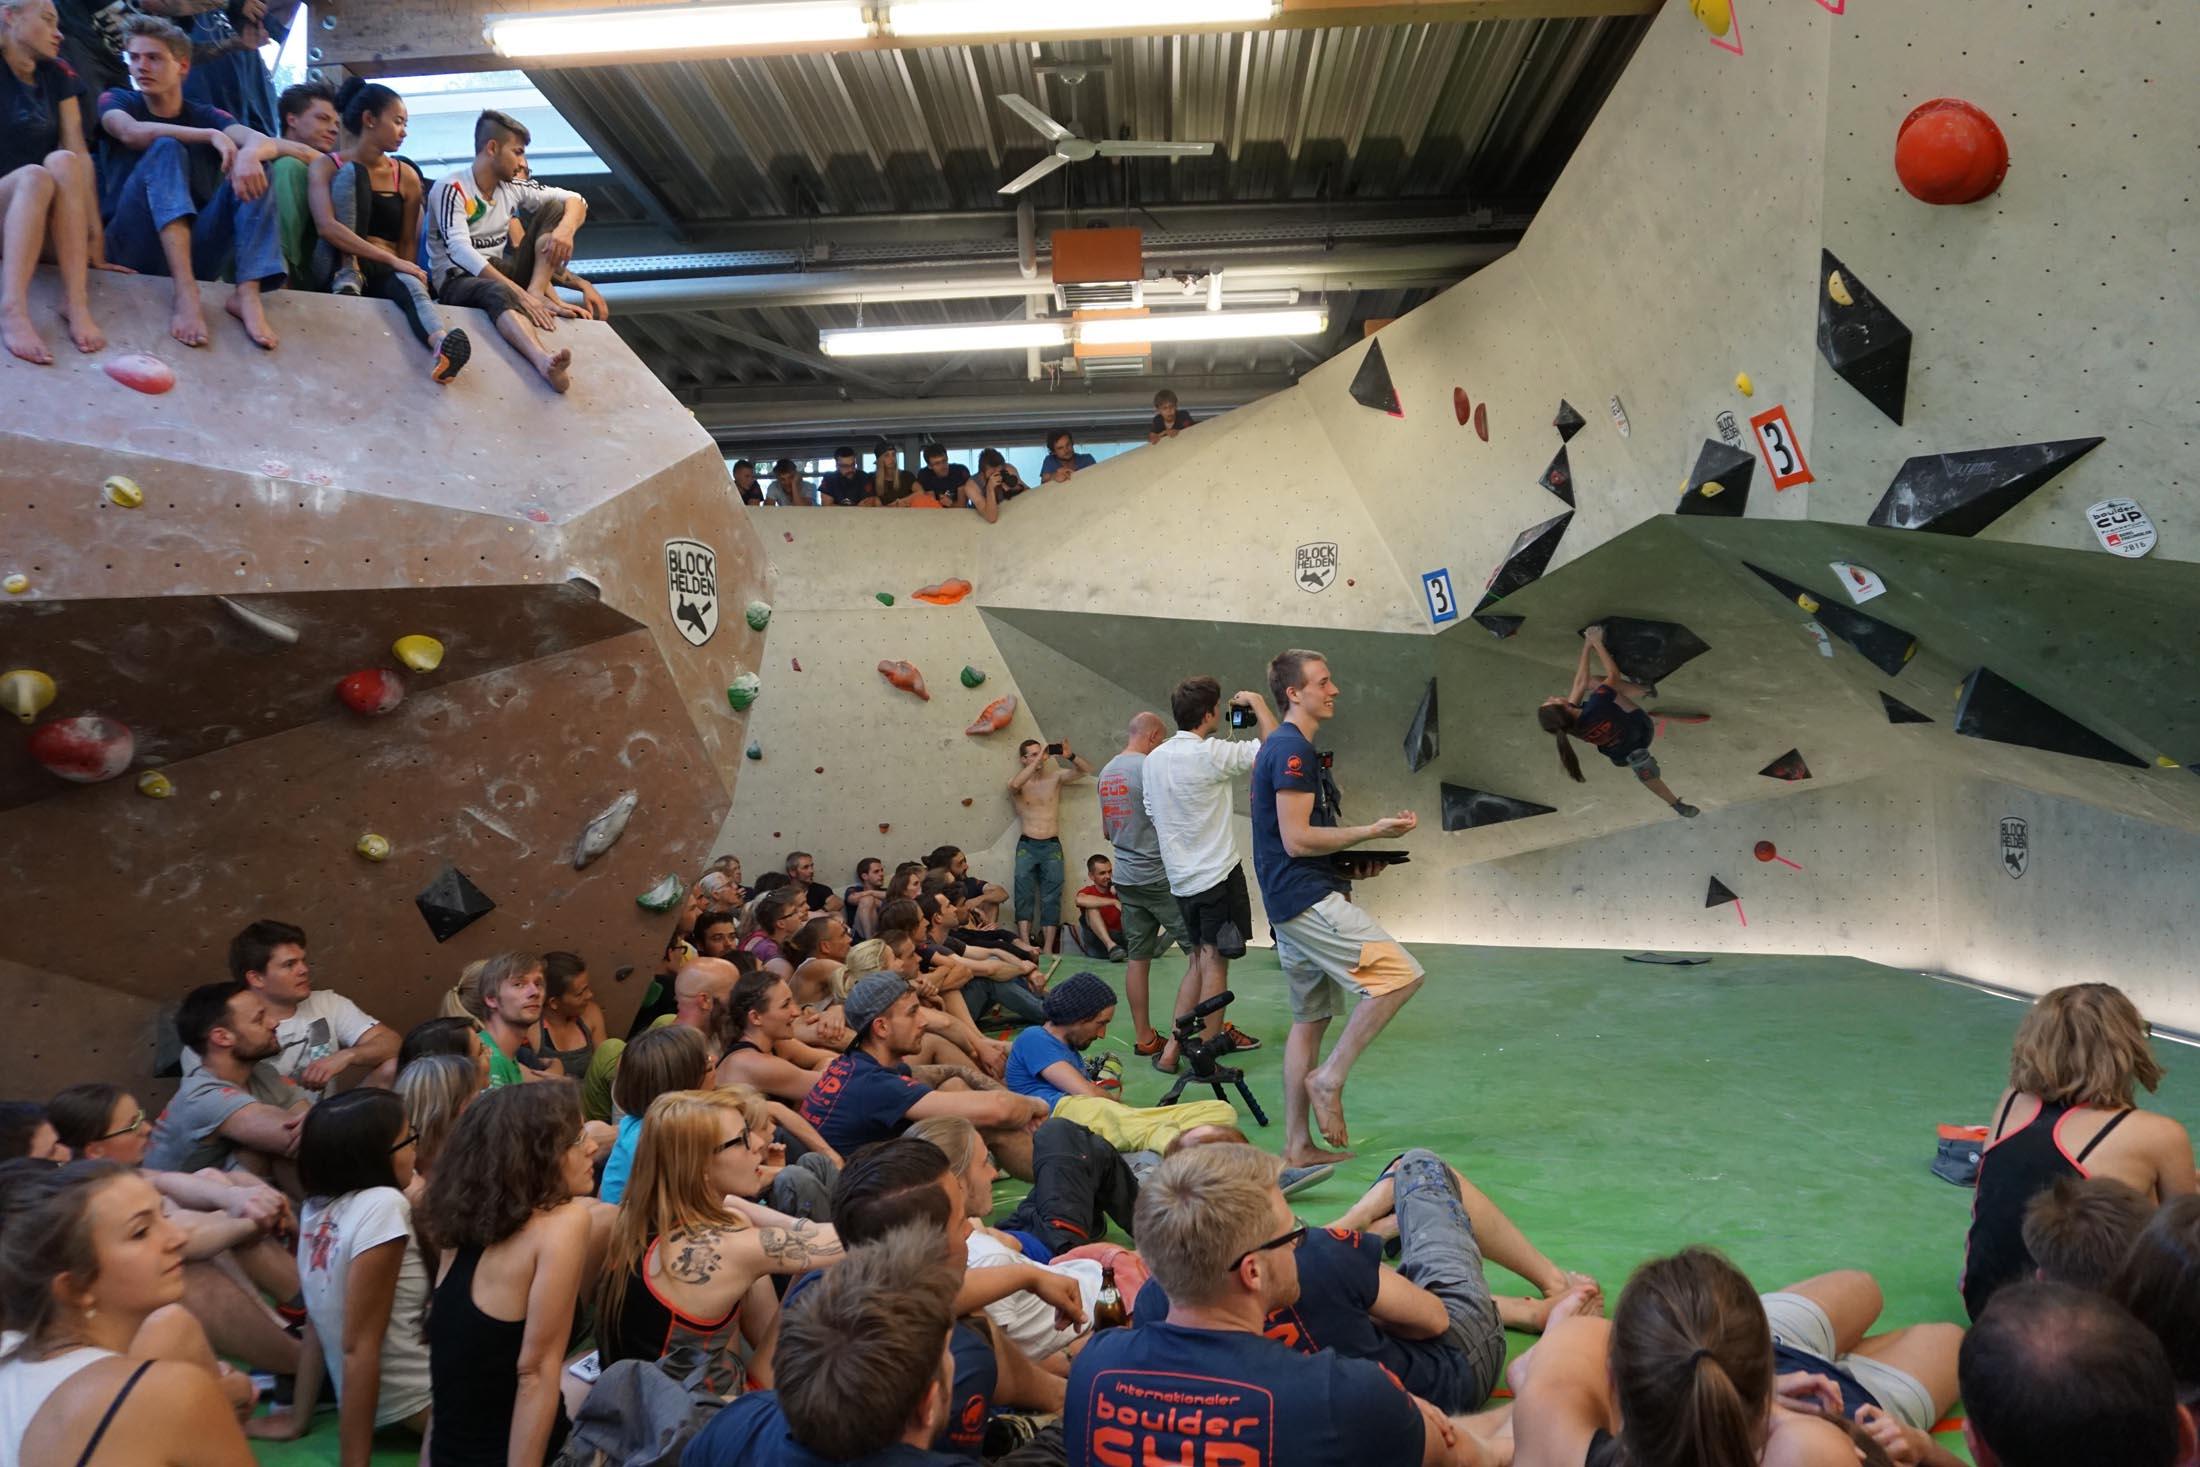 Finale, internationaler bouldercup Frankenjura 2016, BLOCKHELDEN Erlangen, Mammut, Bergfreunde.de, Boulderwettkampf07092016685